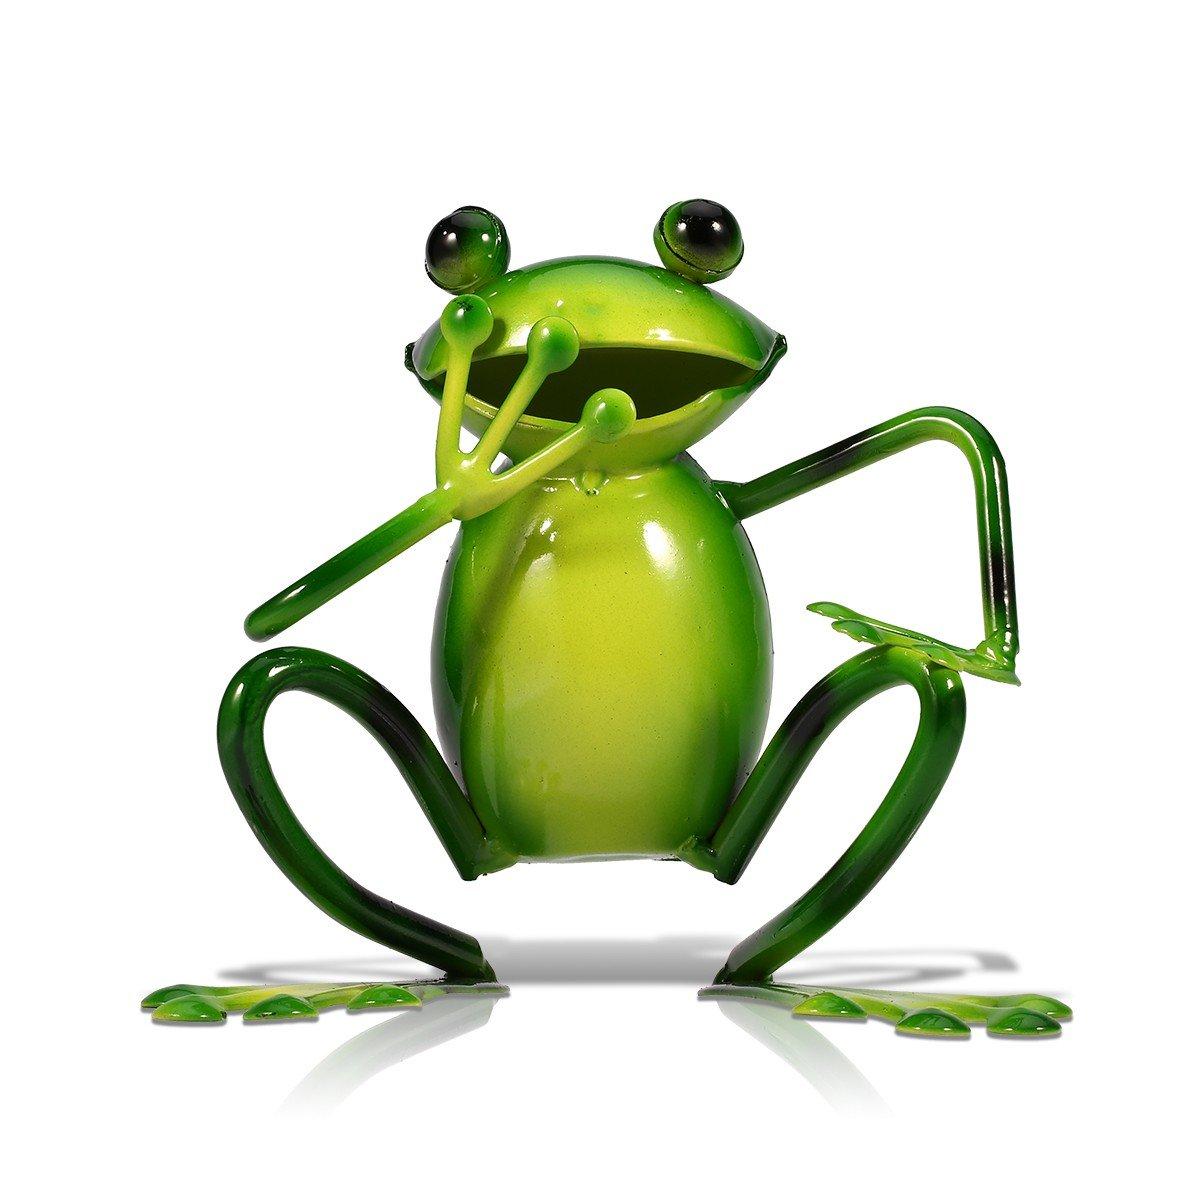 Tooarts Metal Sculpture Figurine Statue Ornament Crafts Frog